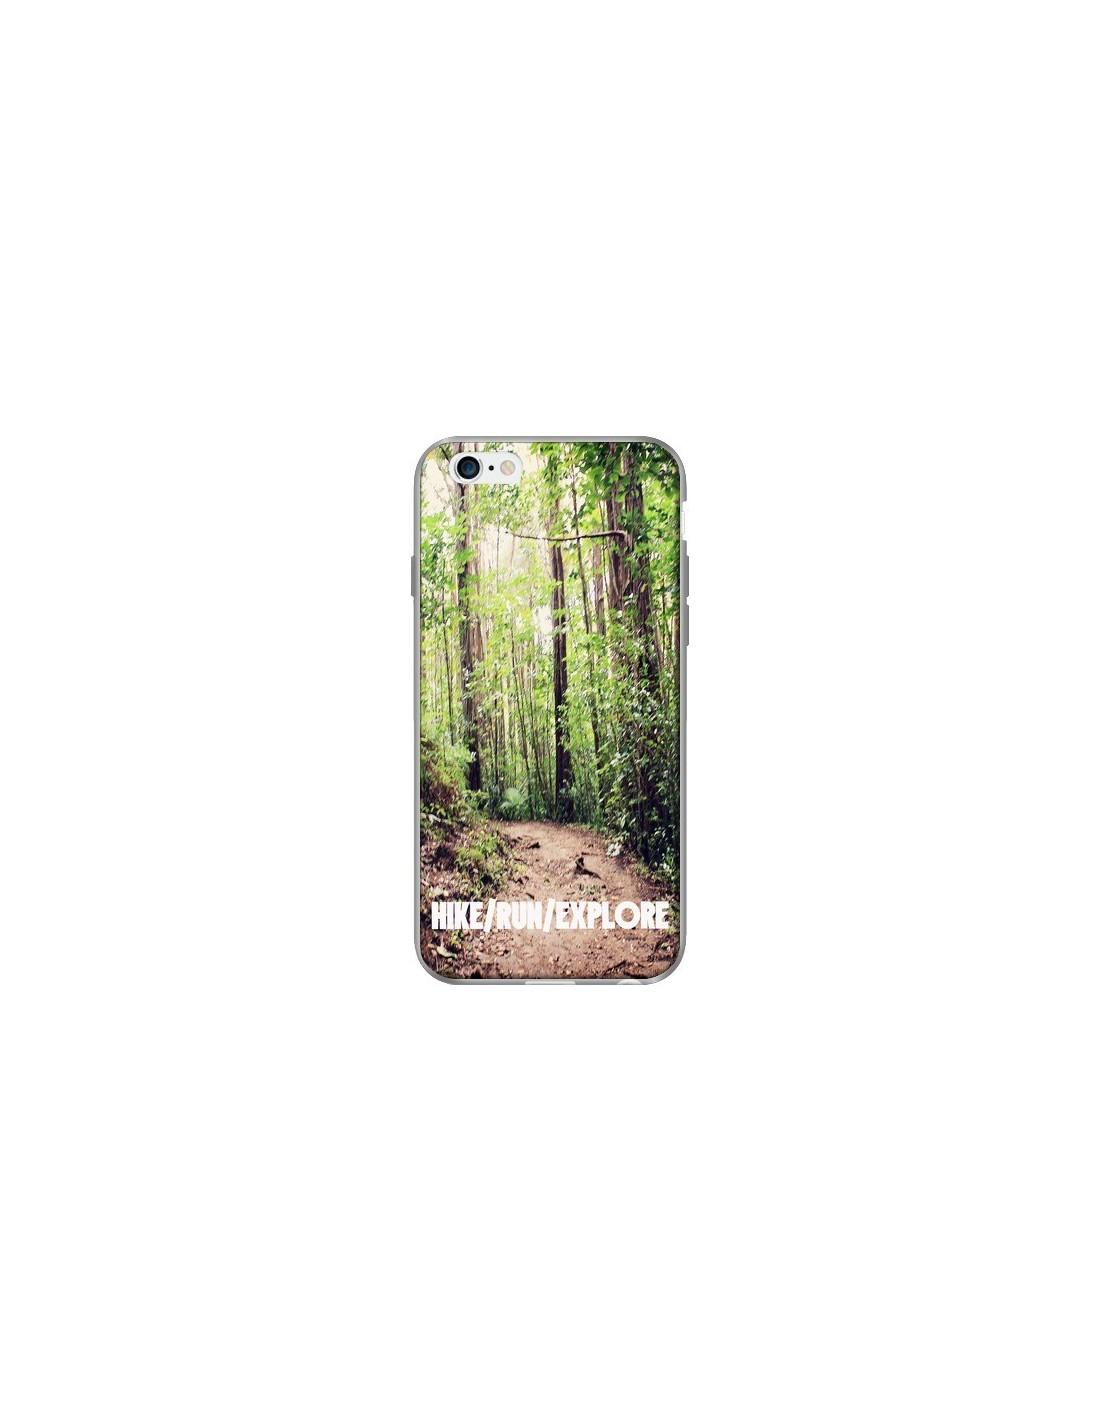 iphone 6 coque foret